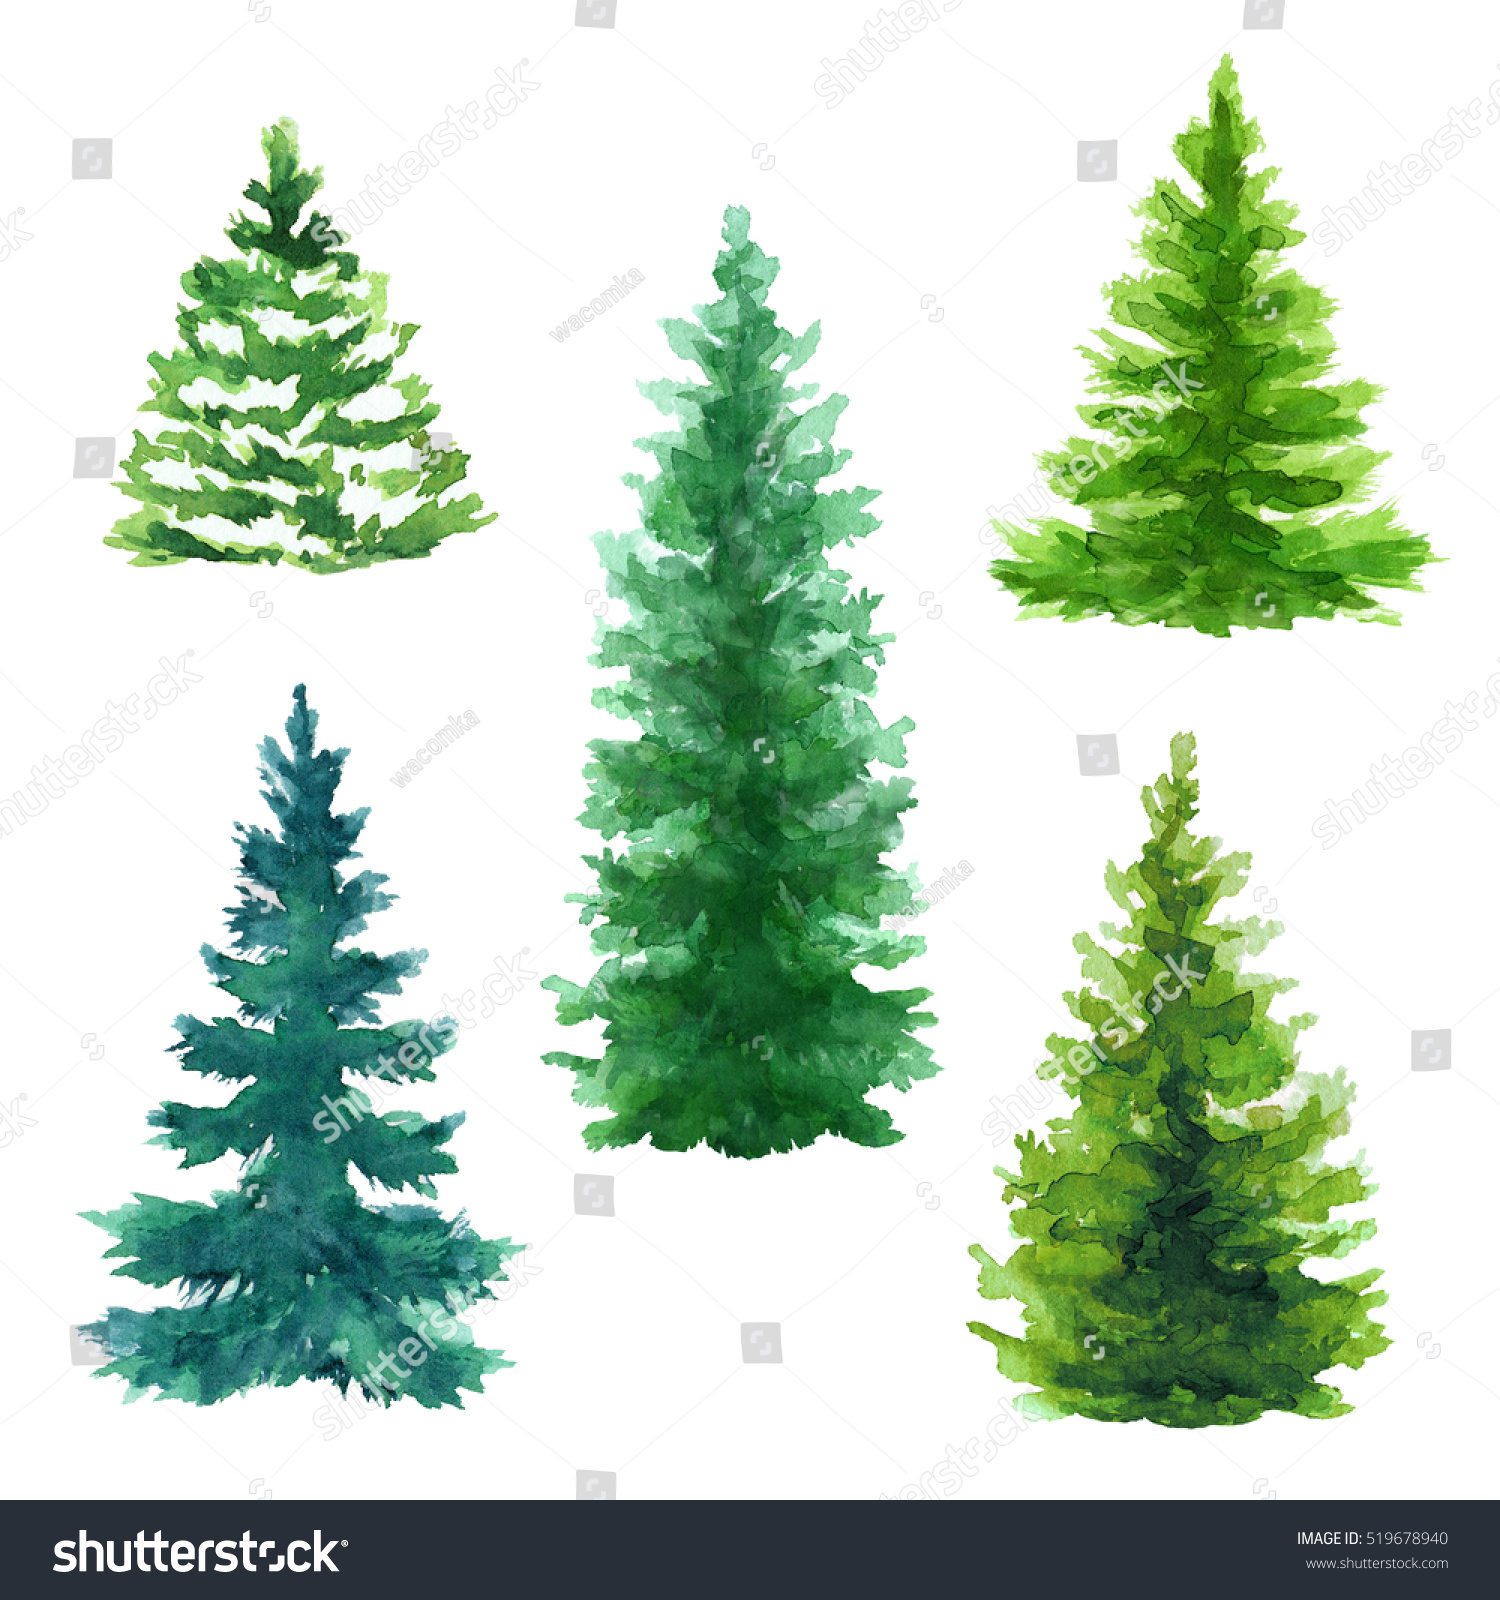 evergreen trees clip art set christmas stock illustration